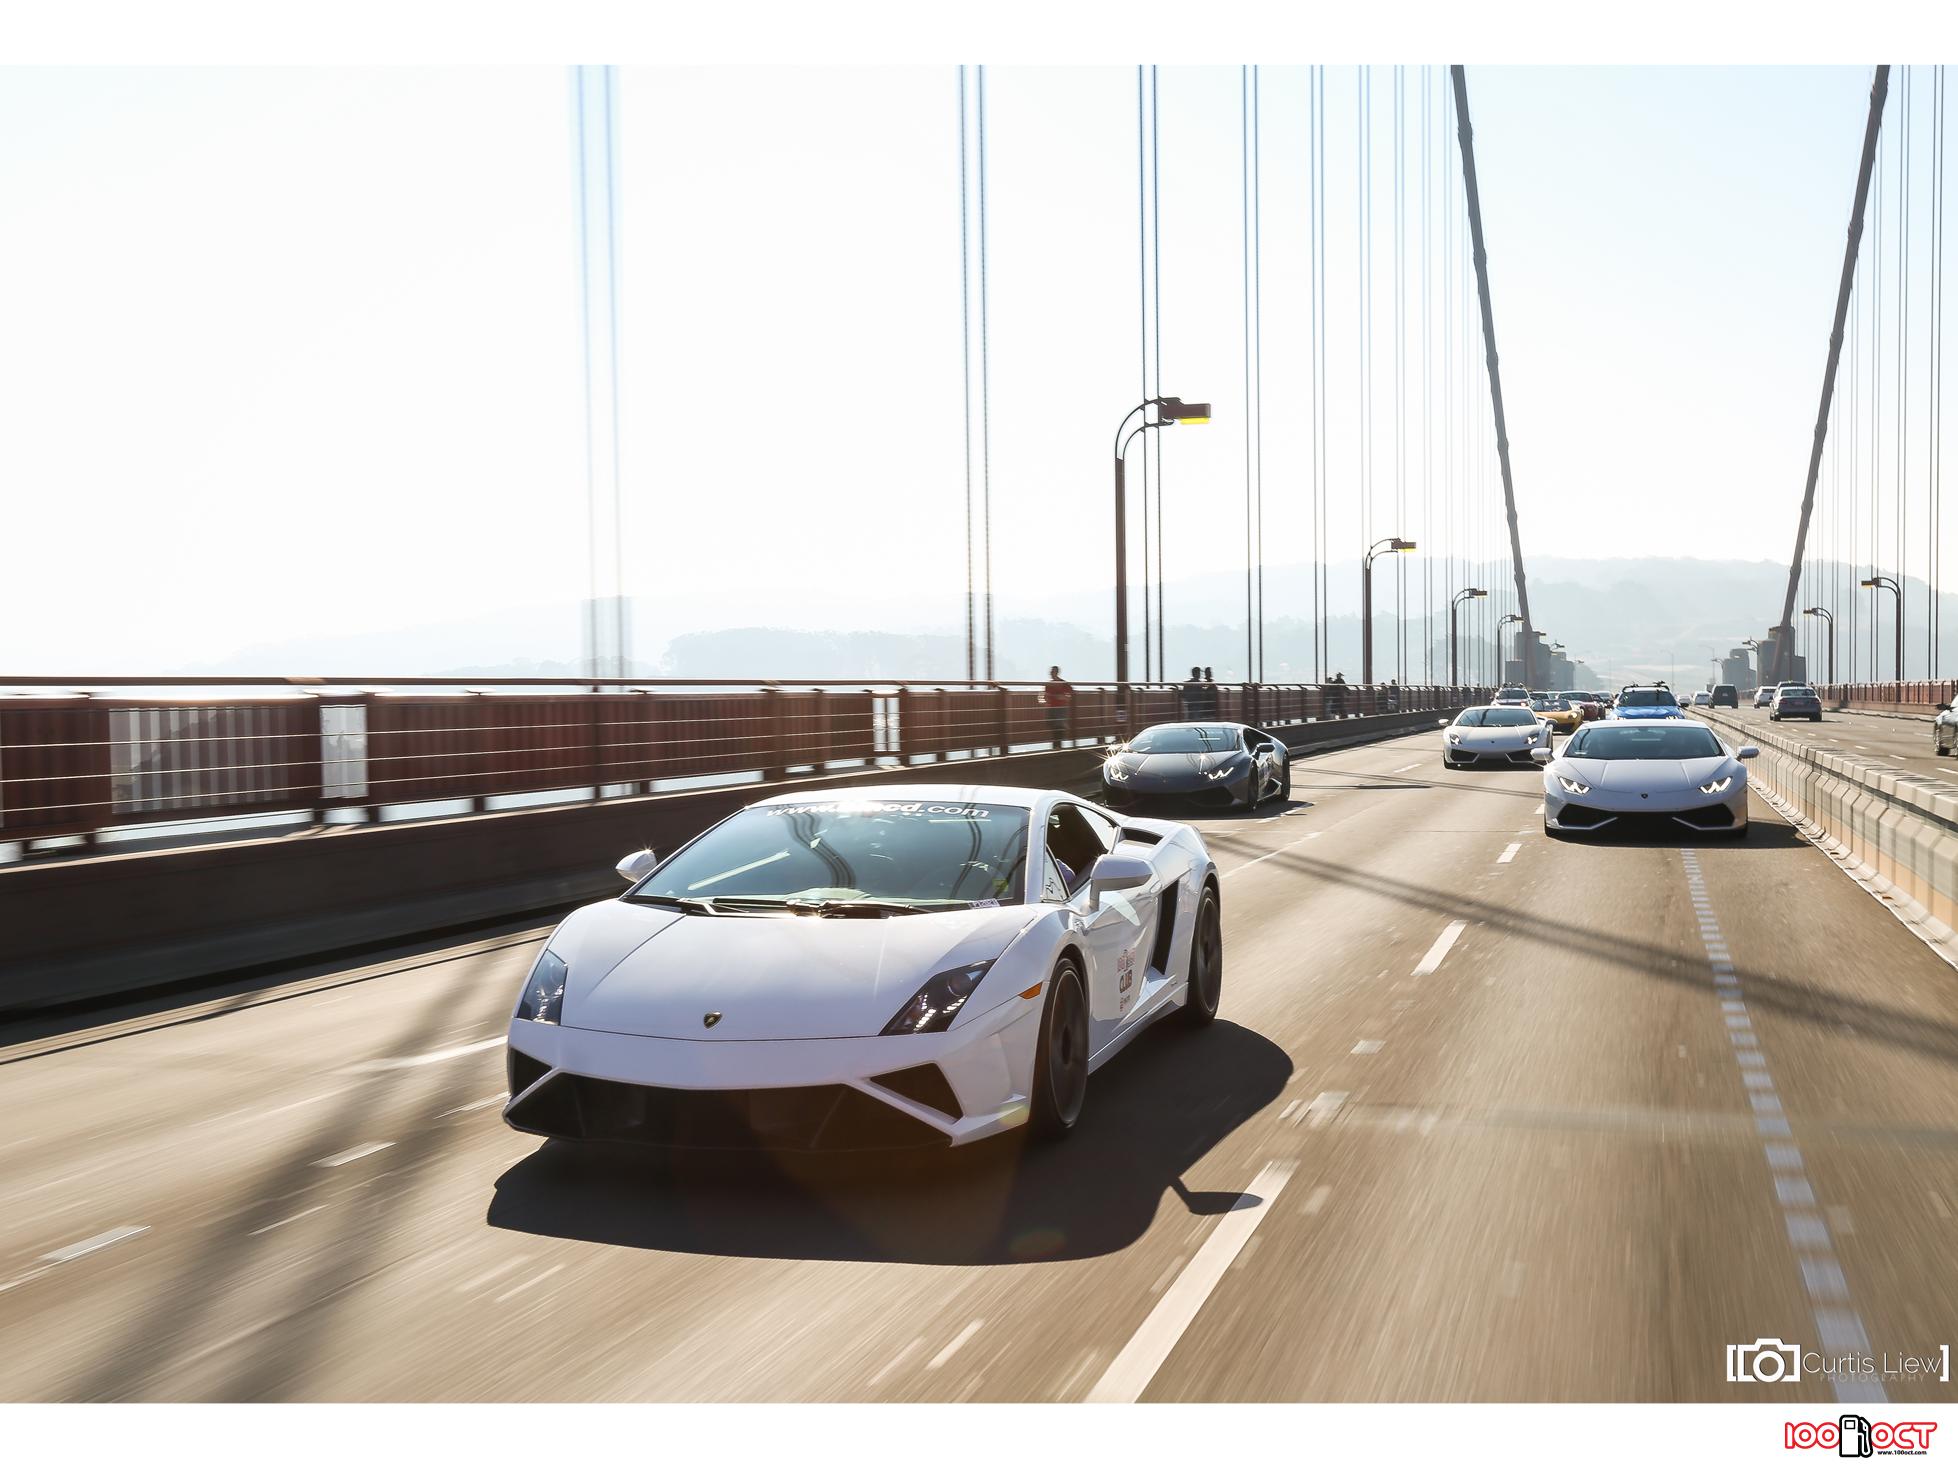 Leading a Lamborghini pack through the Golden Gate! Credits: Curtis Liew